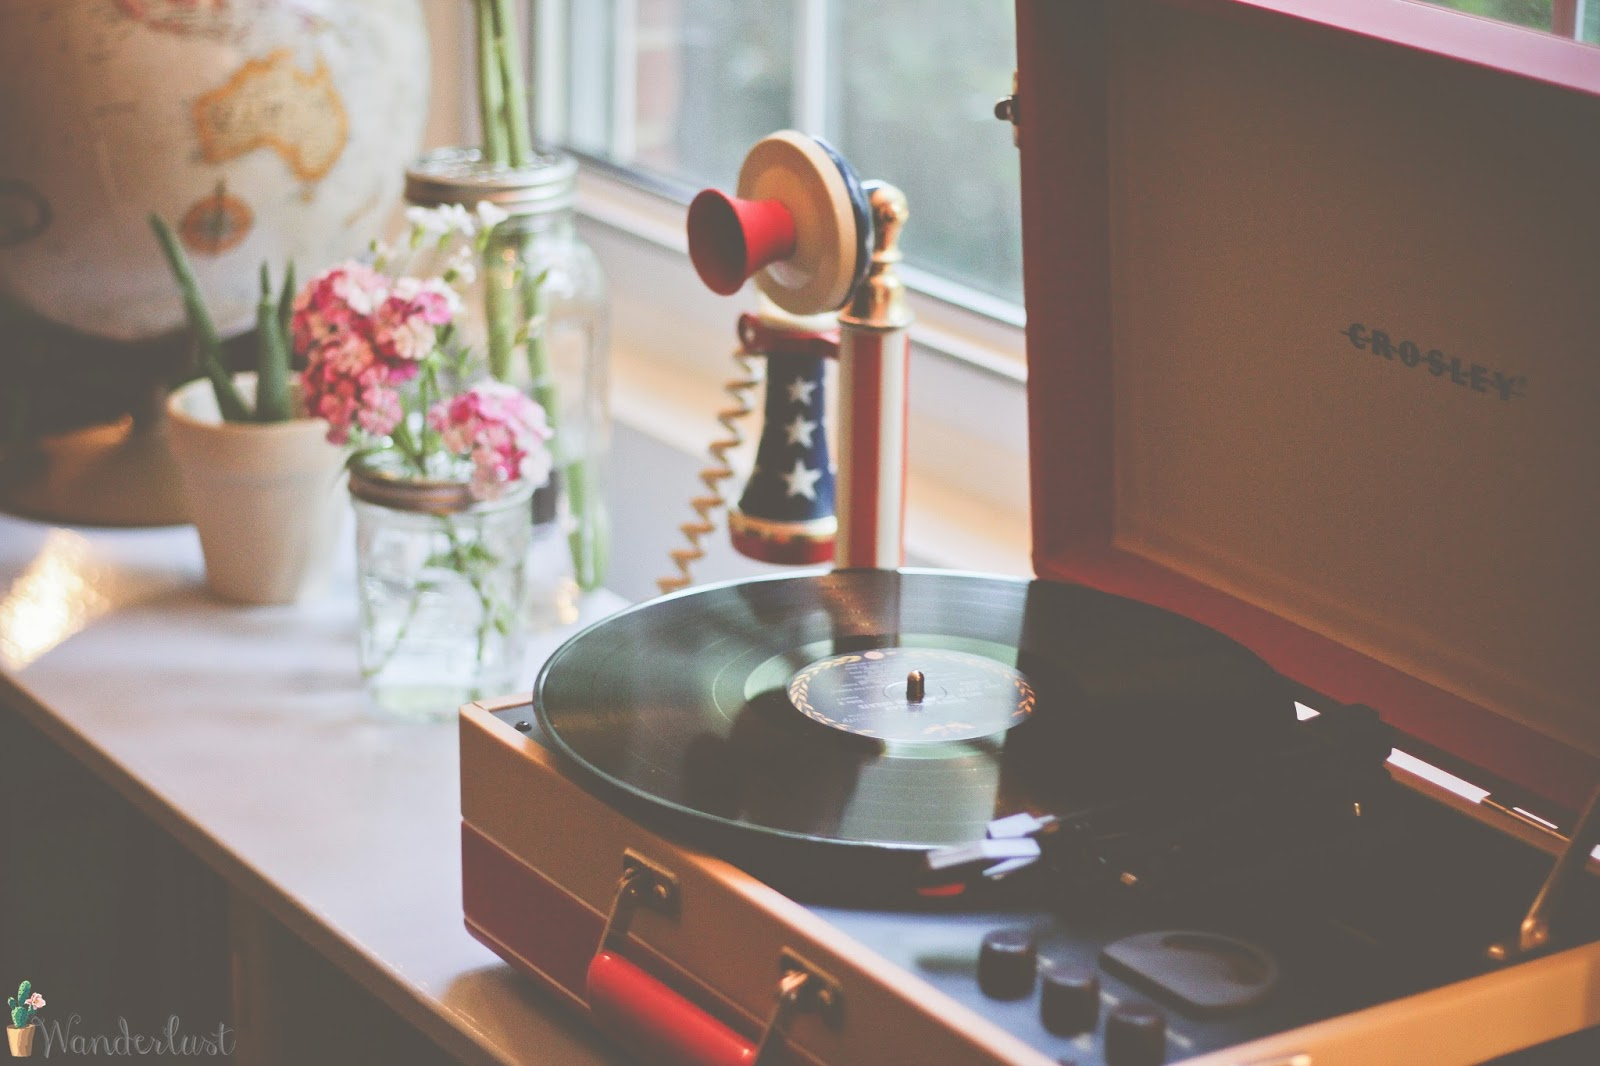 musica, dia das mulheres, spotify, playlists, whm,